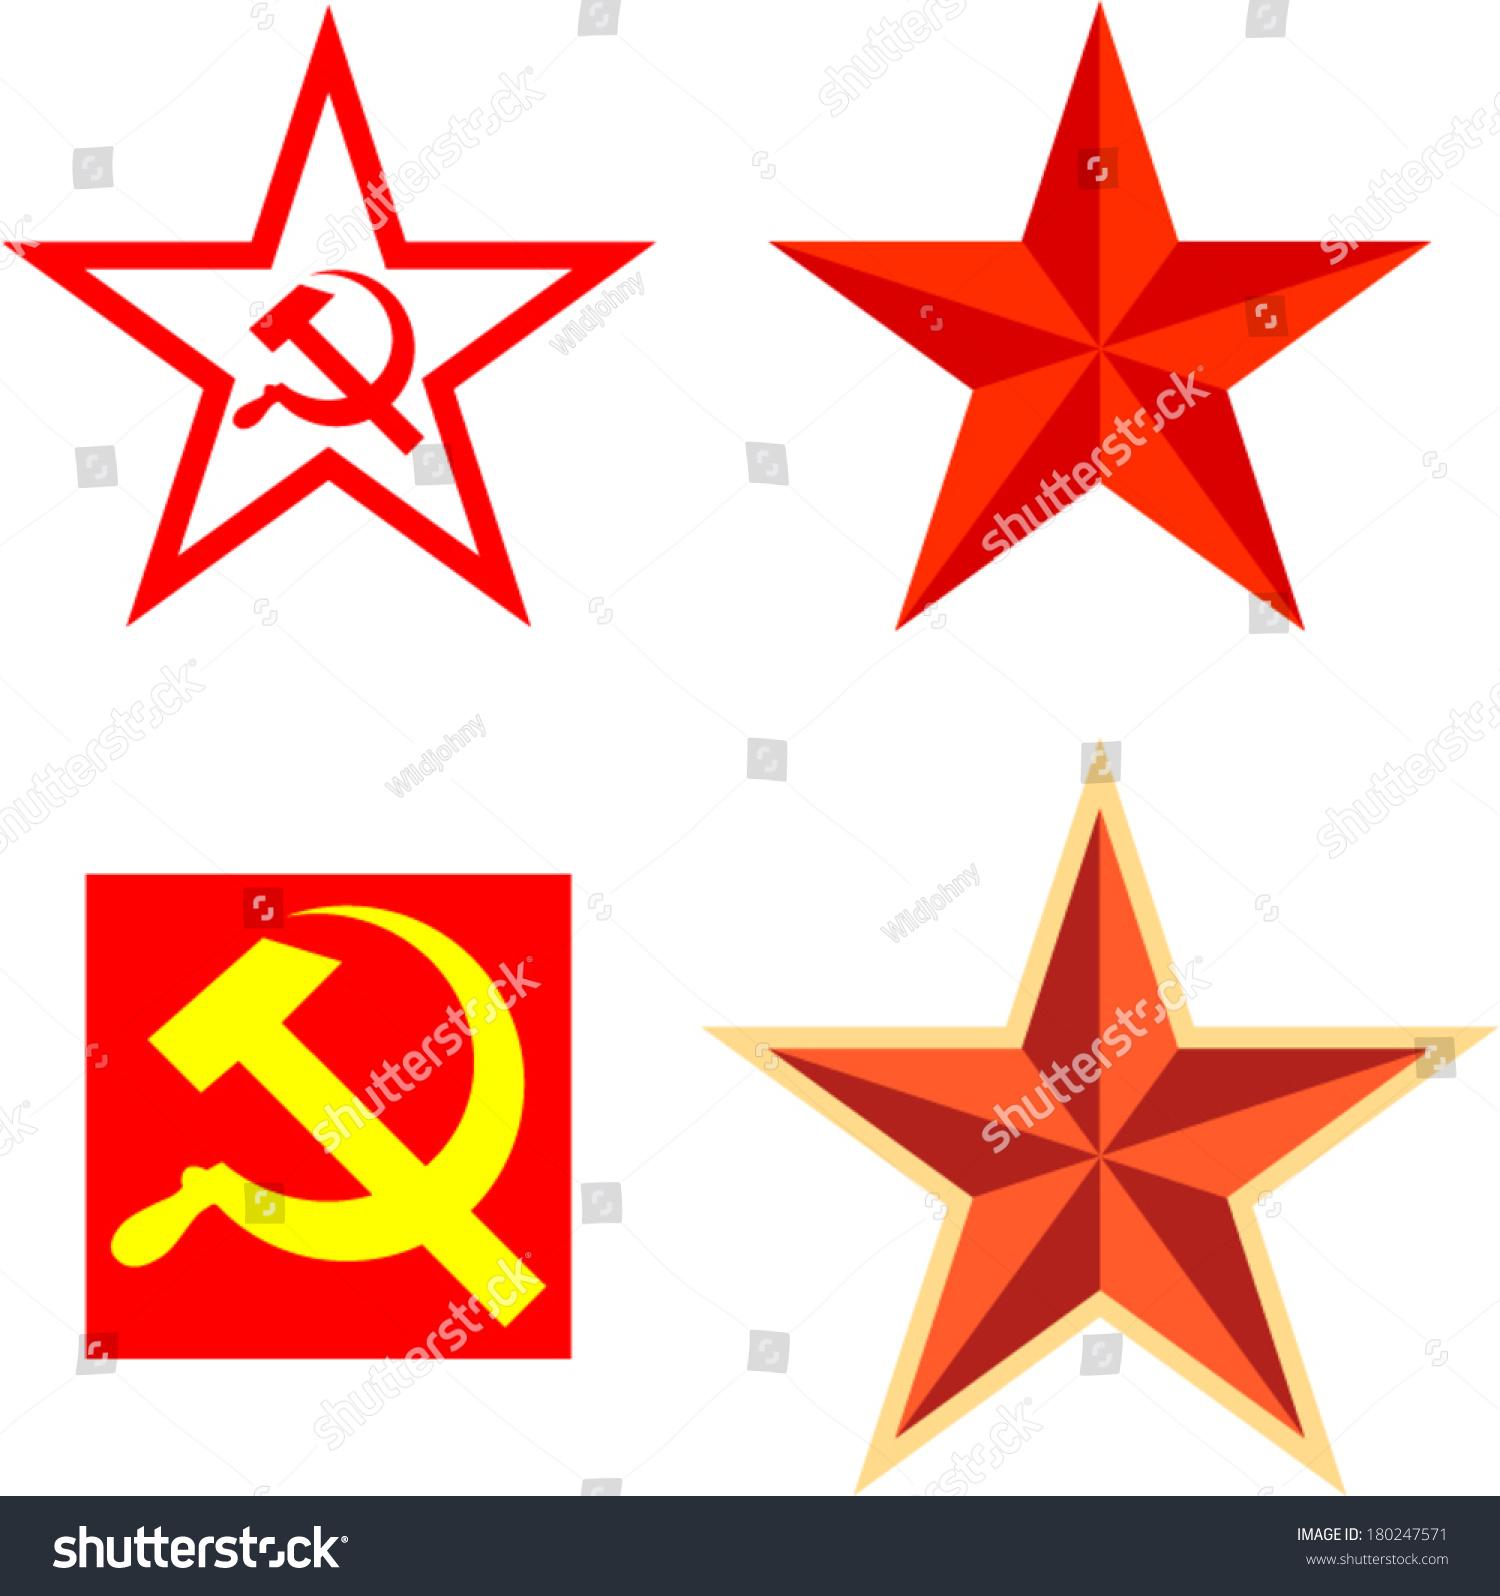 Vector pack communism symbols stock vector 180247571 shutterstock vector pack with communism symbols biocorpaavc